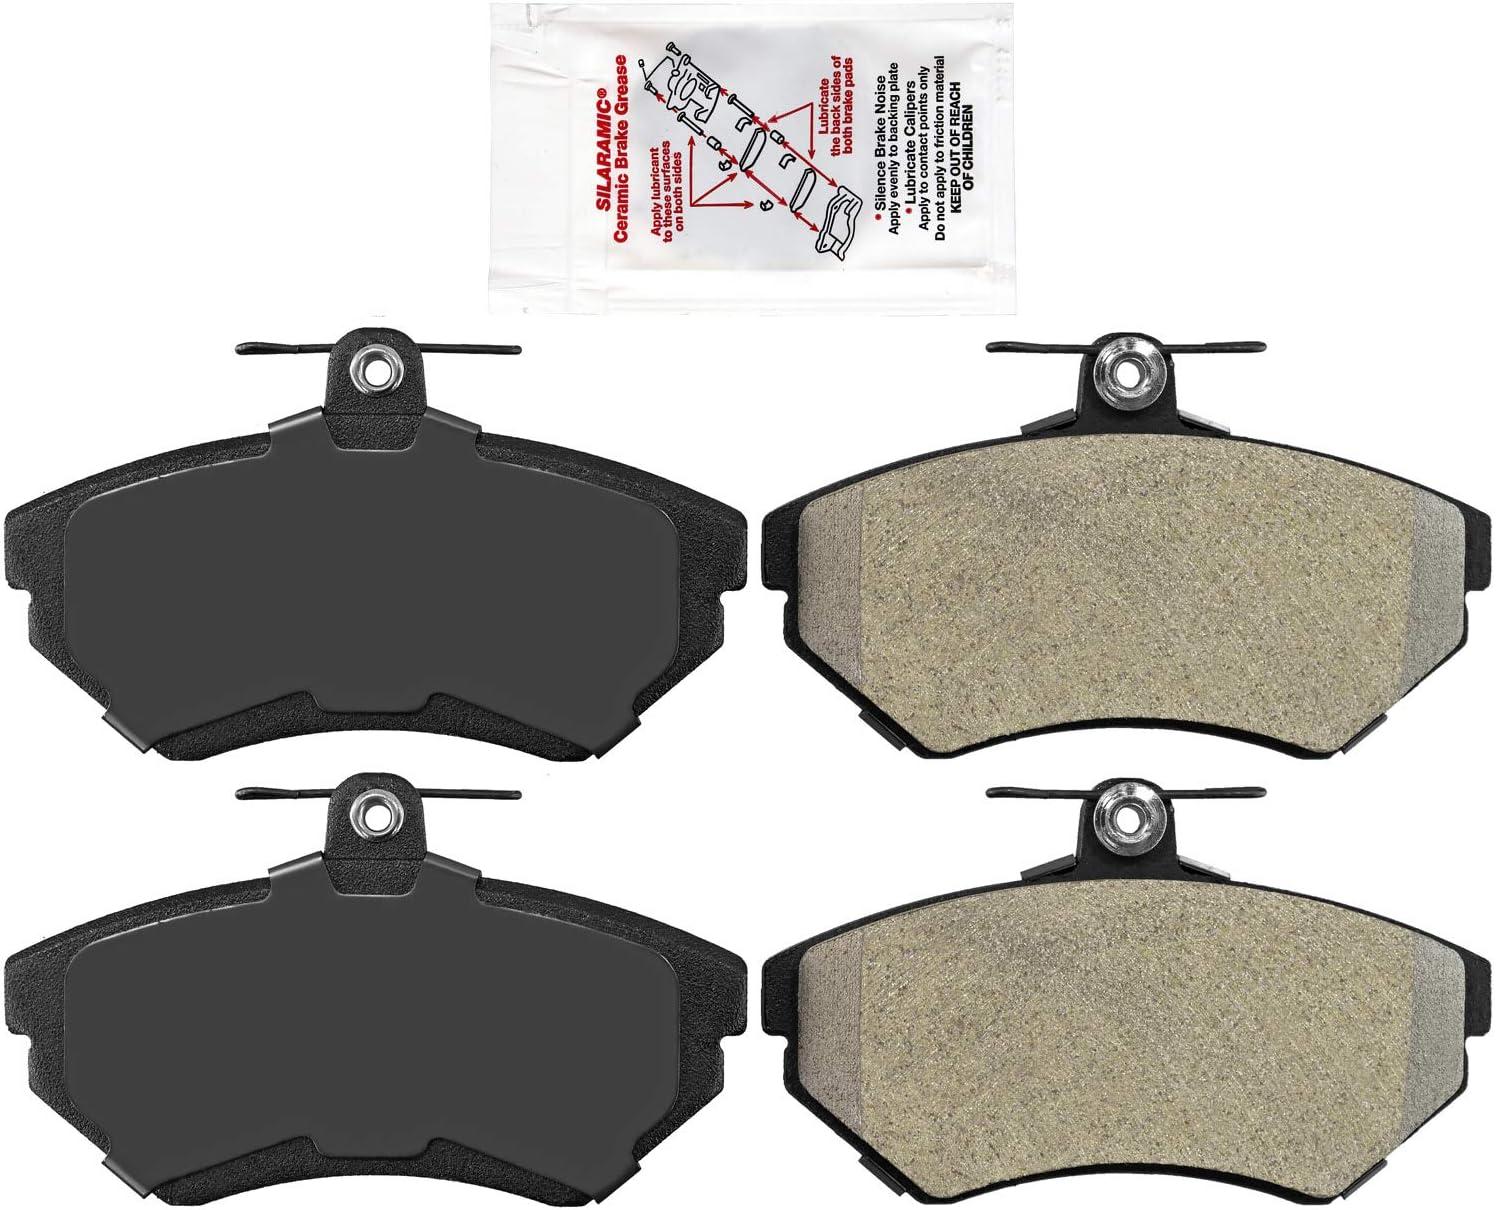 New Disc Brake Pad Set Max 87% OFF Jetta Max 57% OFF Cabrio Golf for